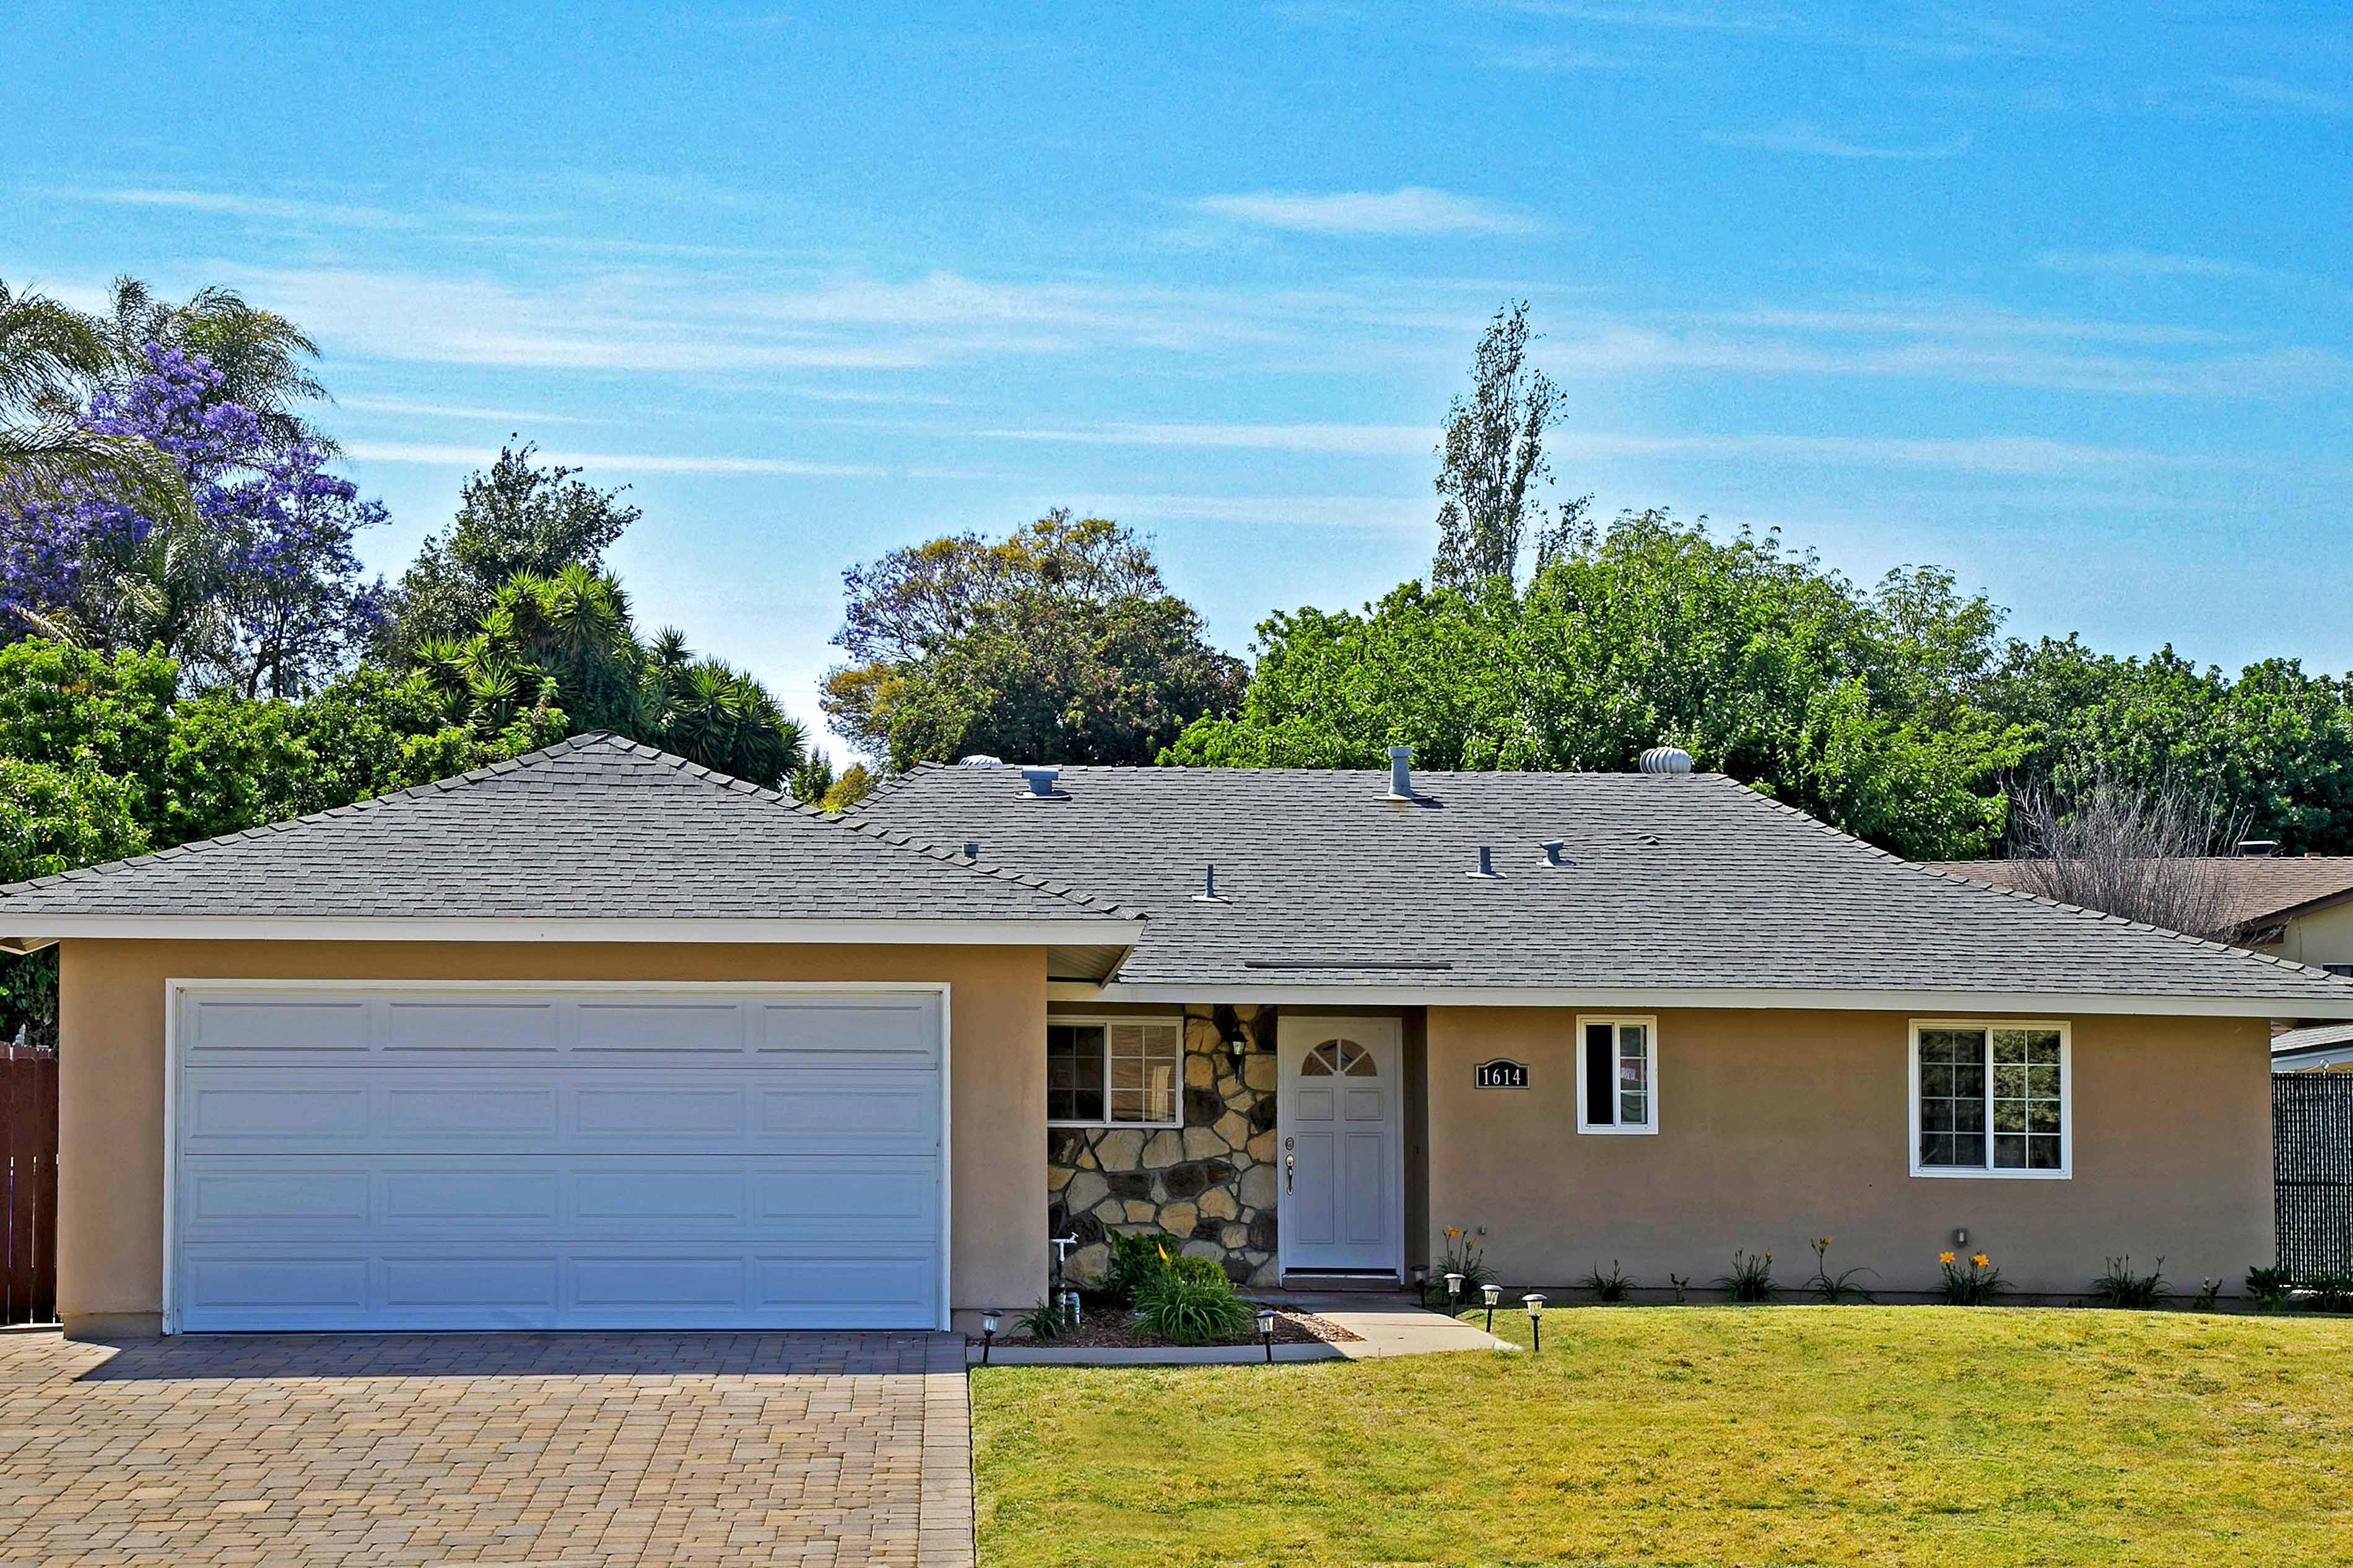 1614 Goodwin Drive, Vista, CA 92084